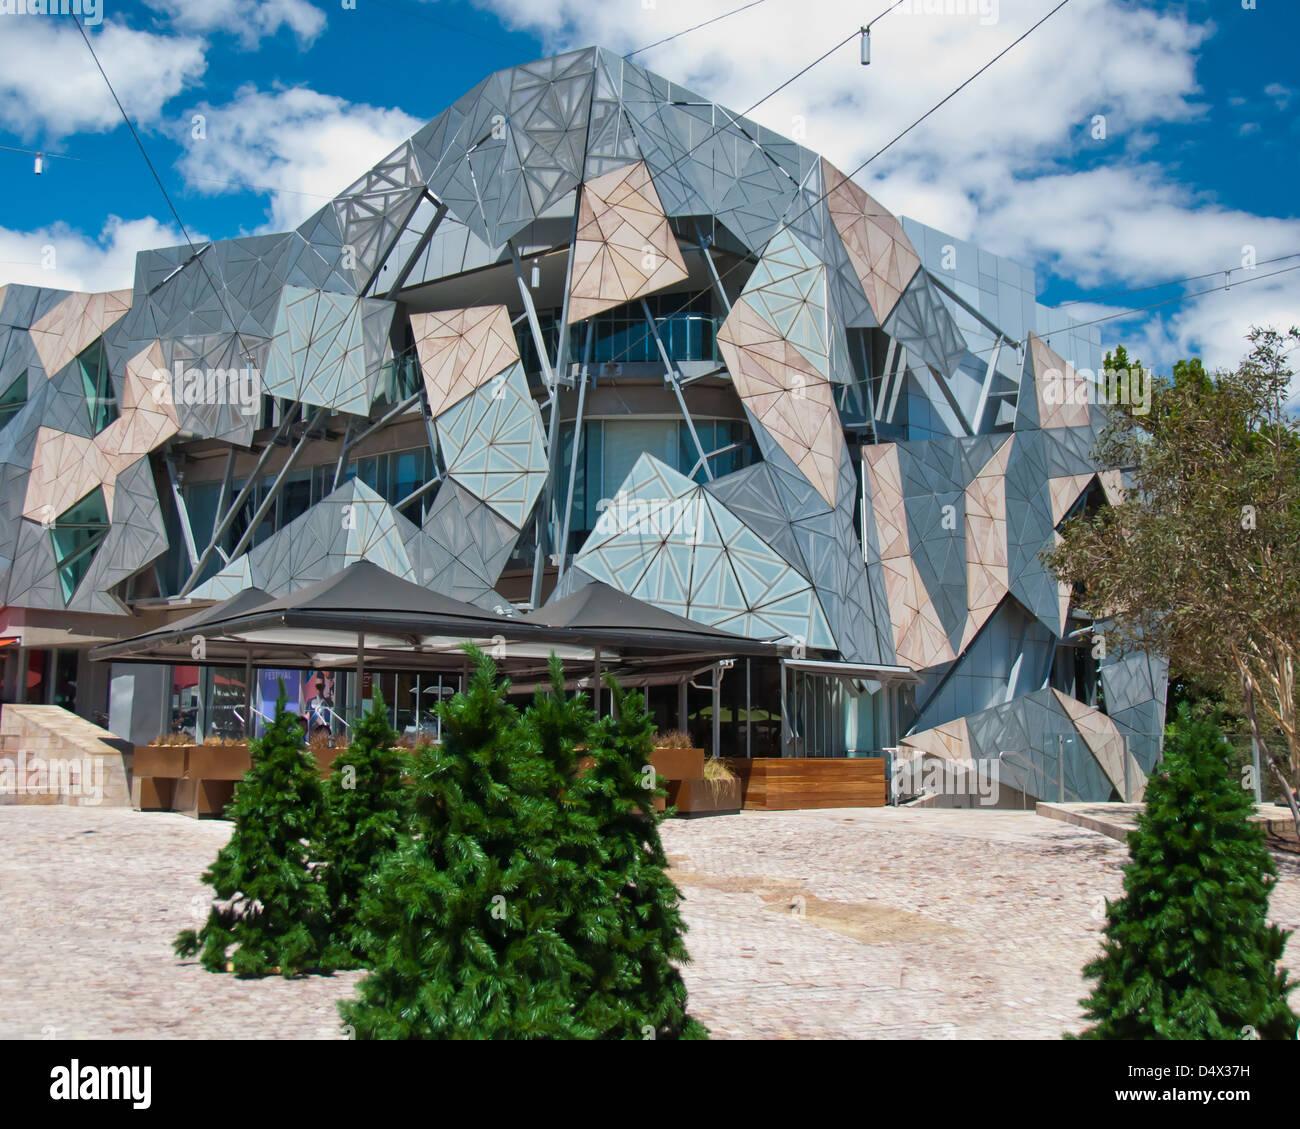 Christmas Trees Melbourne: Federation Square, Melbourne, Australia. Christmas Trees